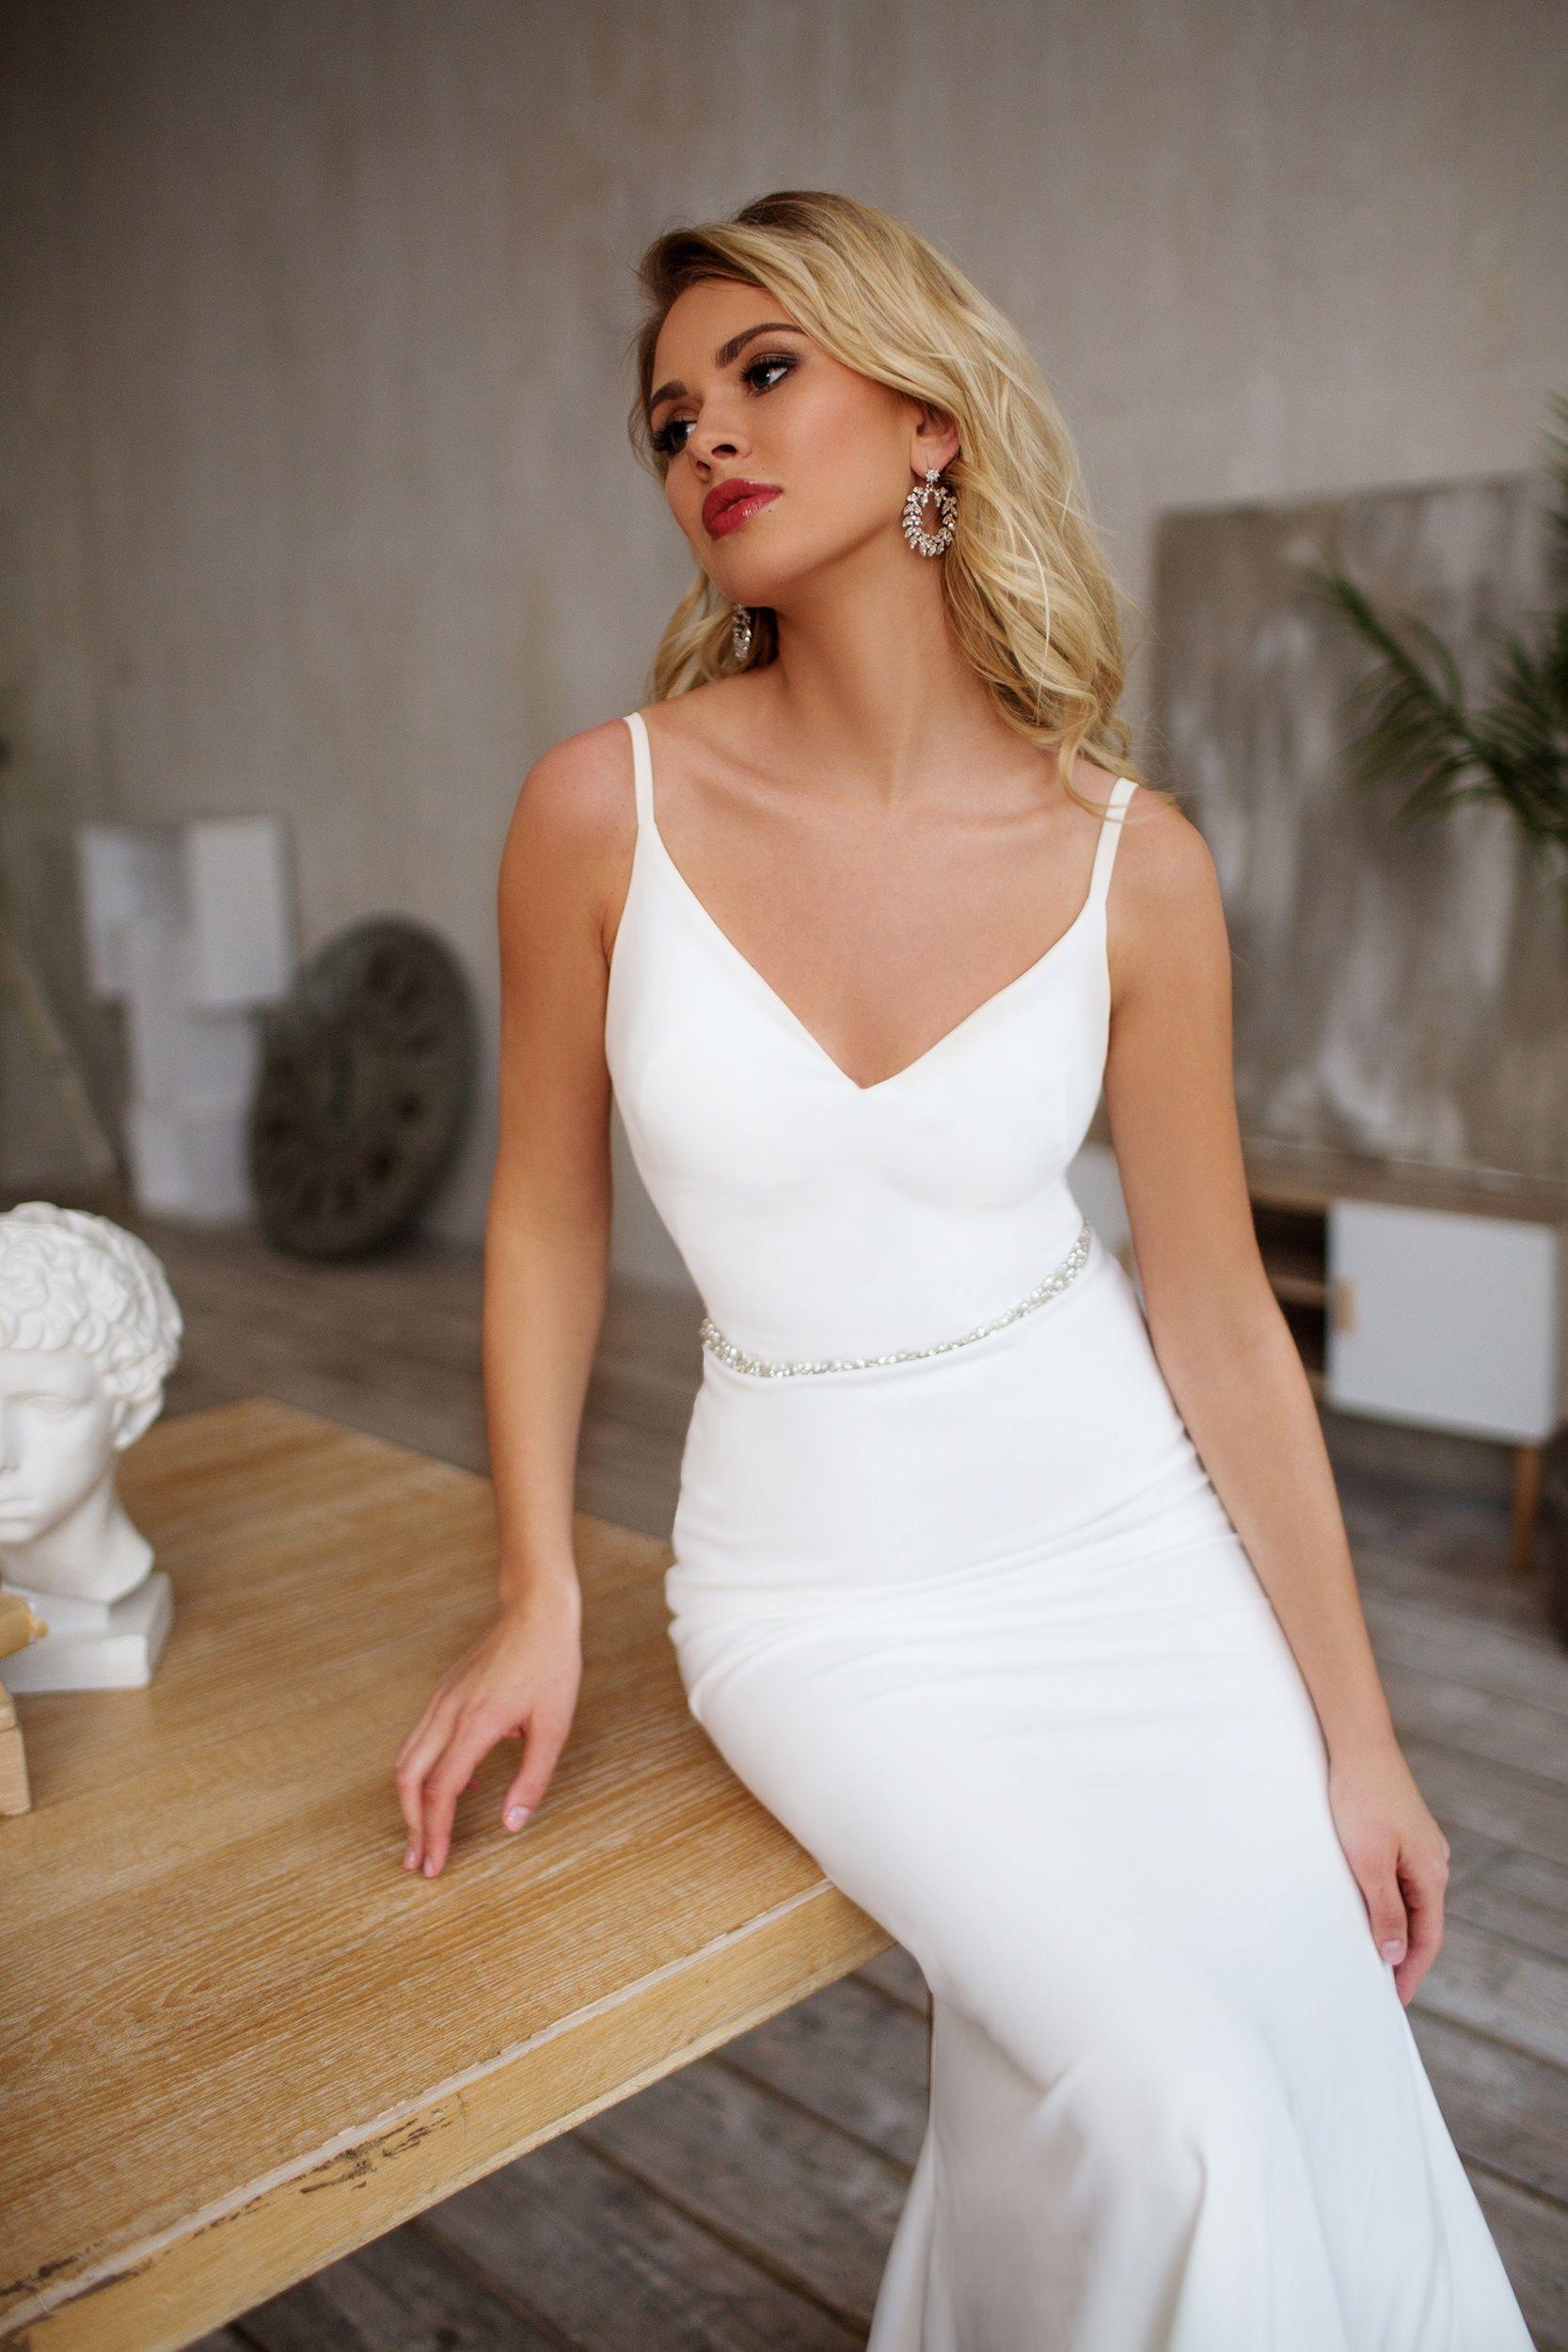 Simple Wedding Dress Casual Elegant In 2021 Wedding Dresses Simple City Wedding Dress Informal Wedding Dresses [ 2500 x 1667 Pixel ]